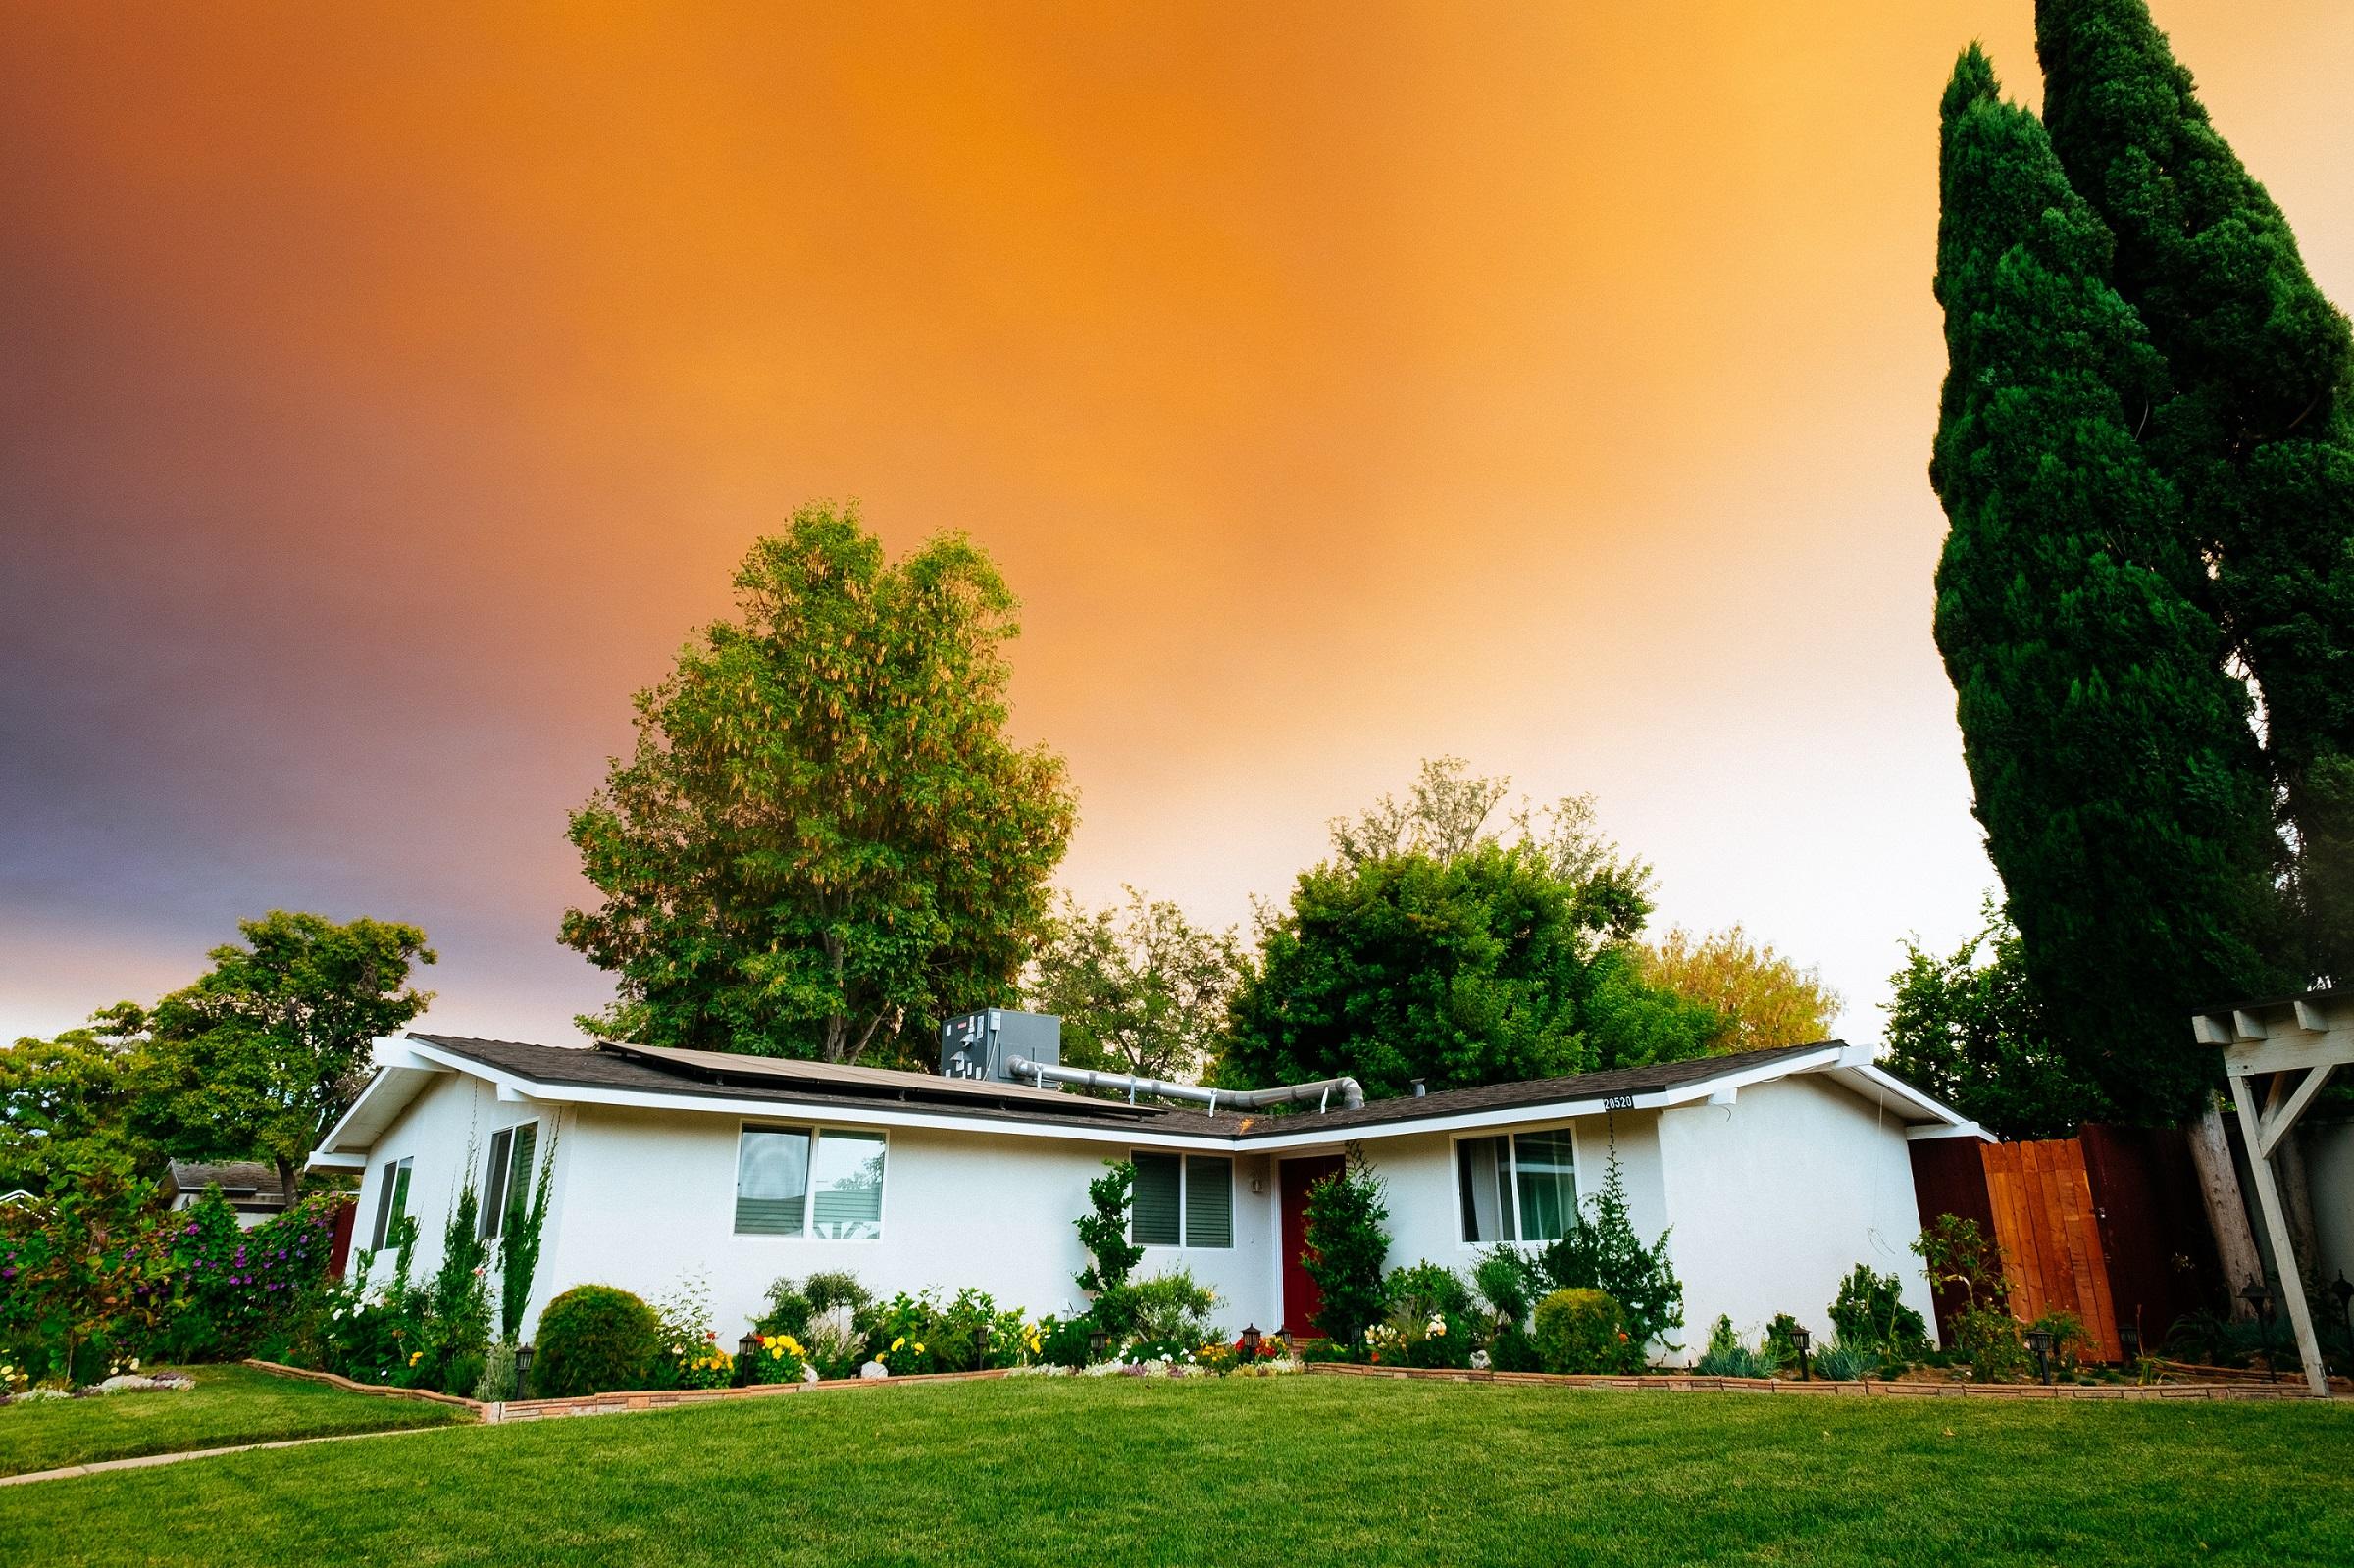 Real estate proposal software